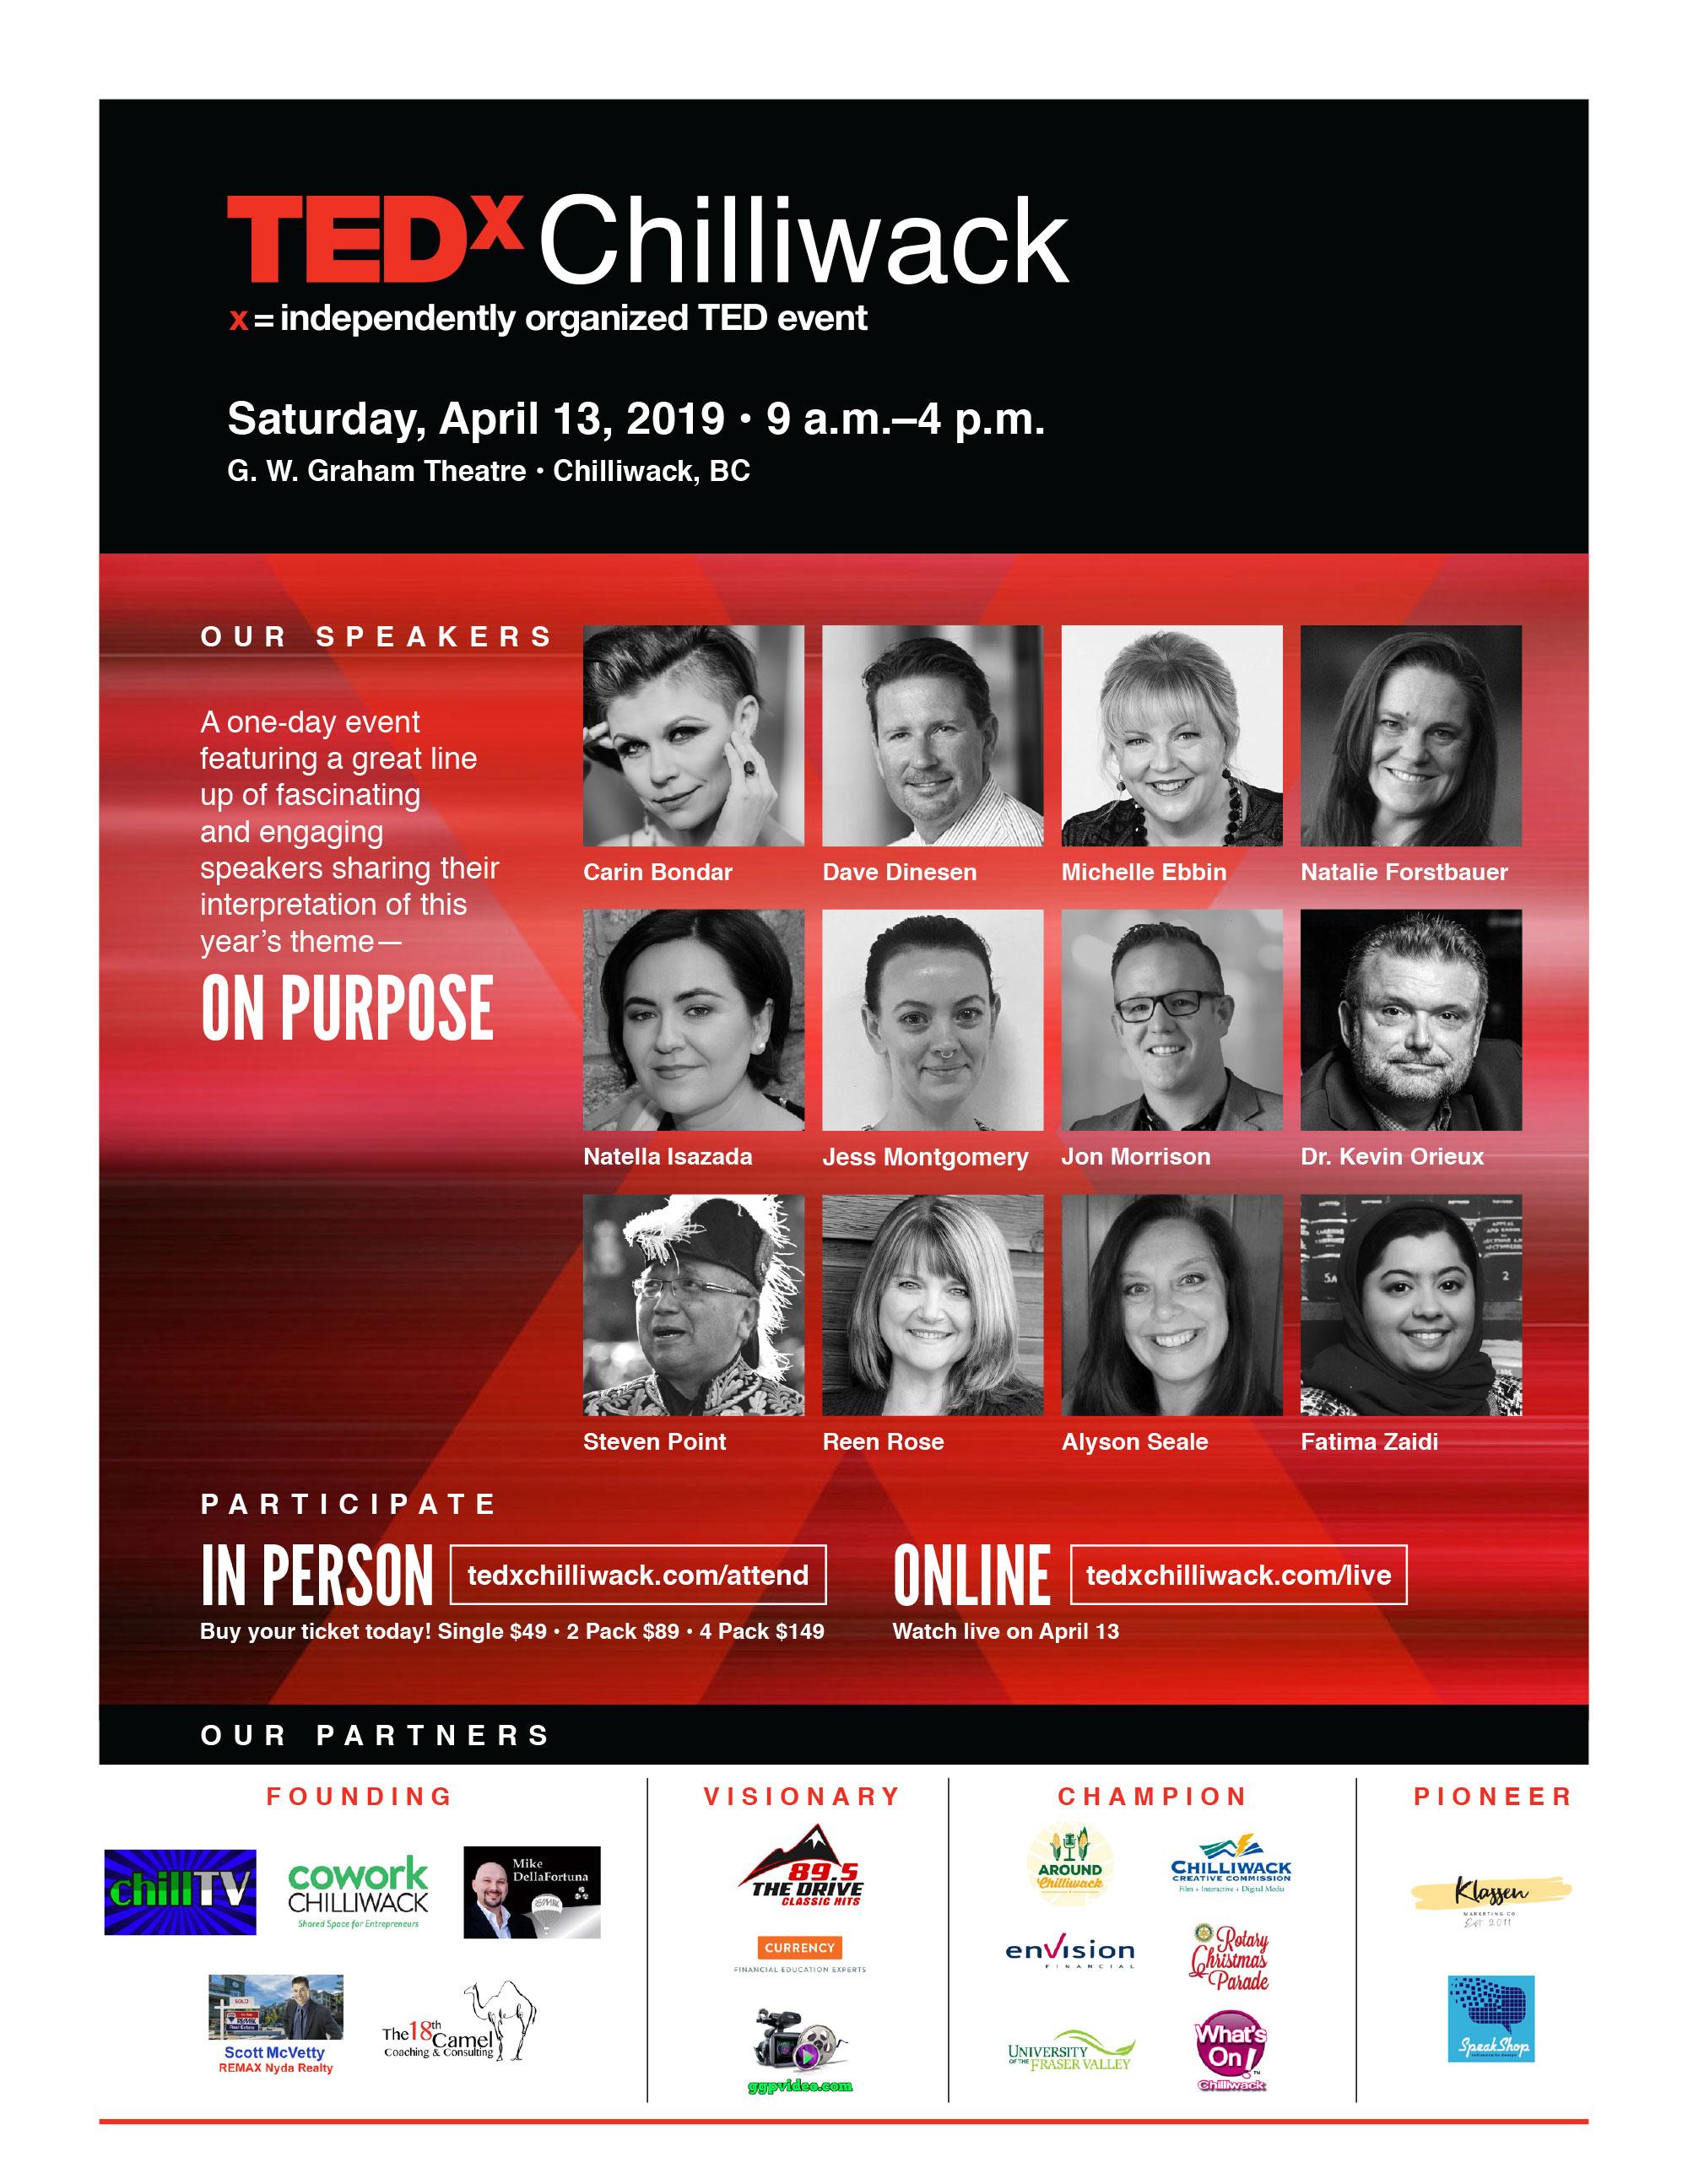 TEDxChilliwack-2019-Poster-Event.jpg